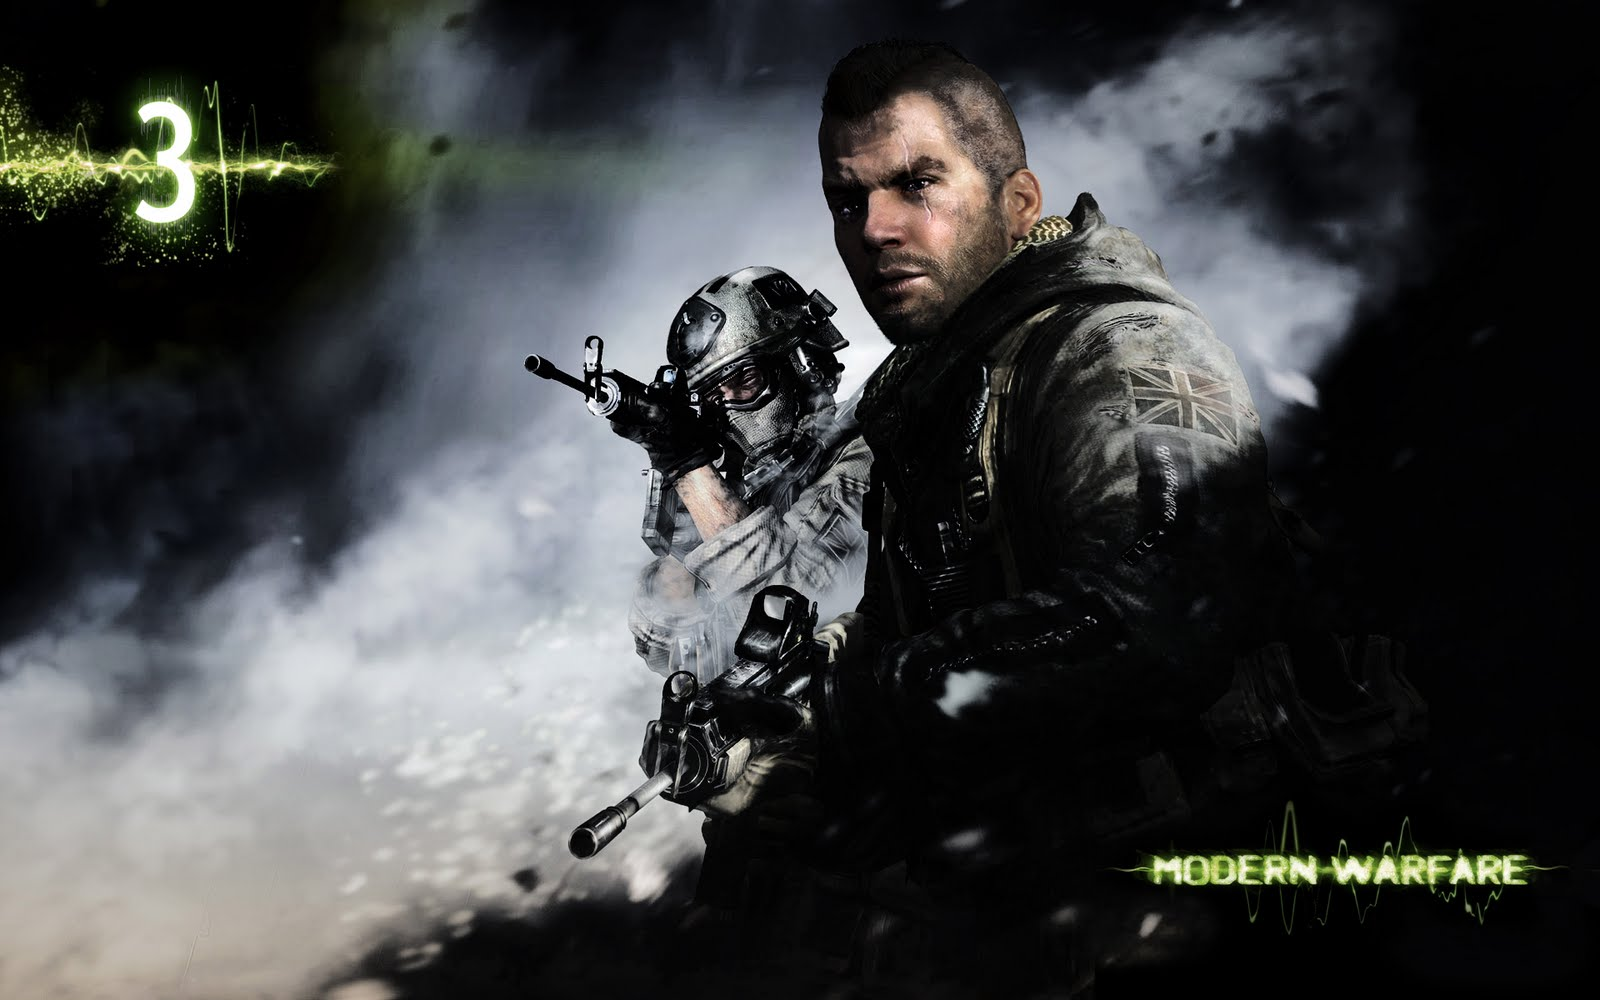 http://4.bp.blogspot.com/-Dpramy8YaJw/TdsmWyKaEWI/AAAAAAAAAJU/AWGFCeBk_Hg/s1600/Modern-Warfare-3-1920x1200.jpg